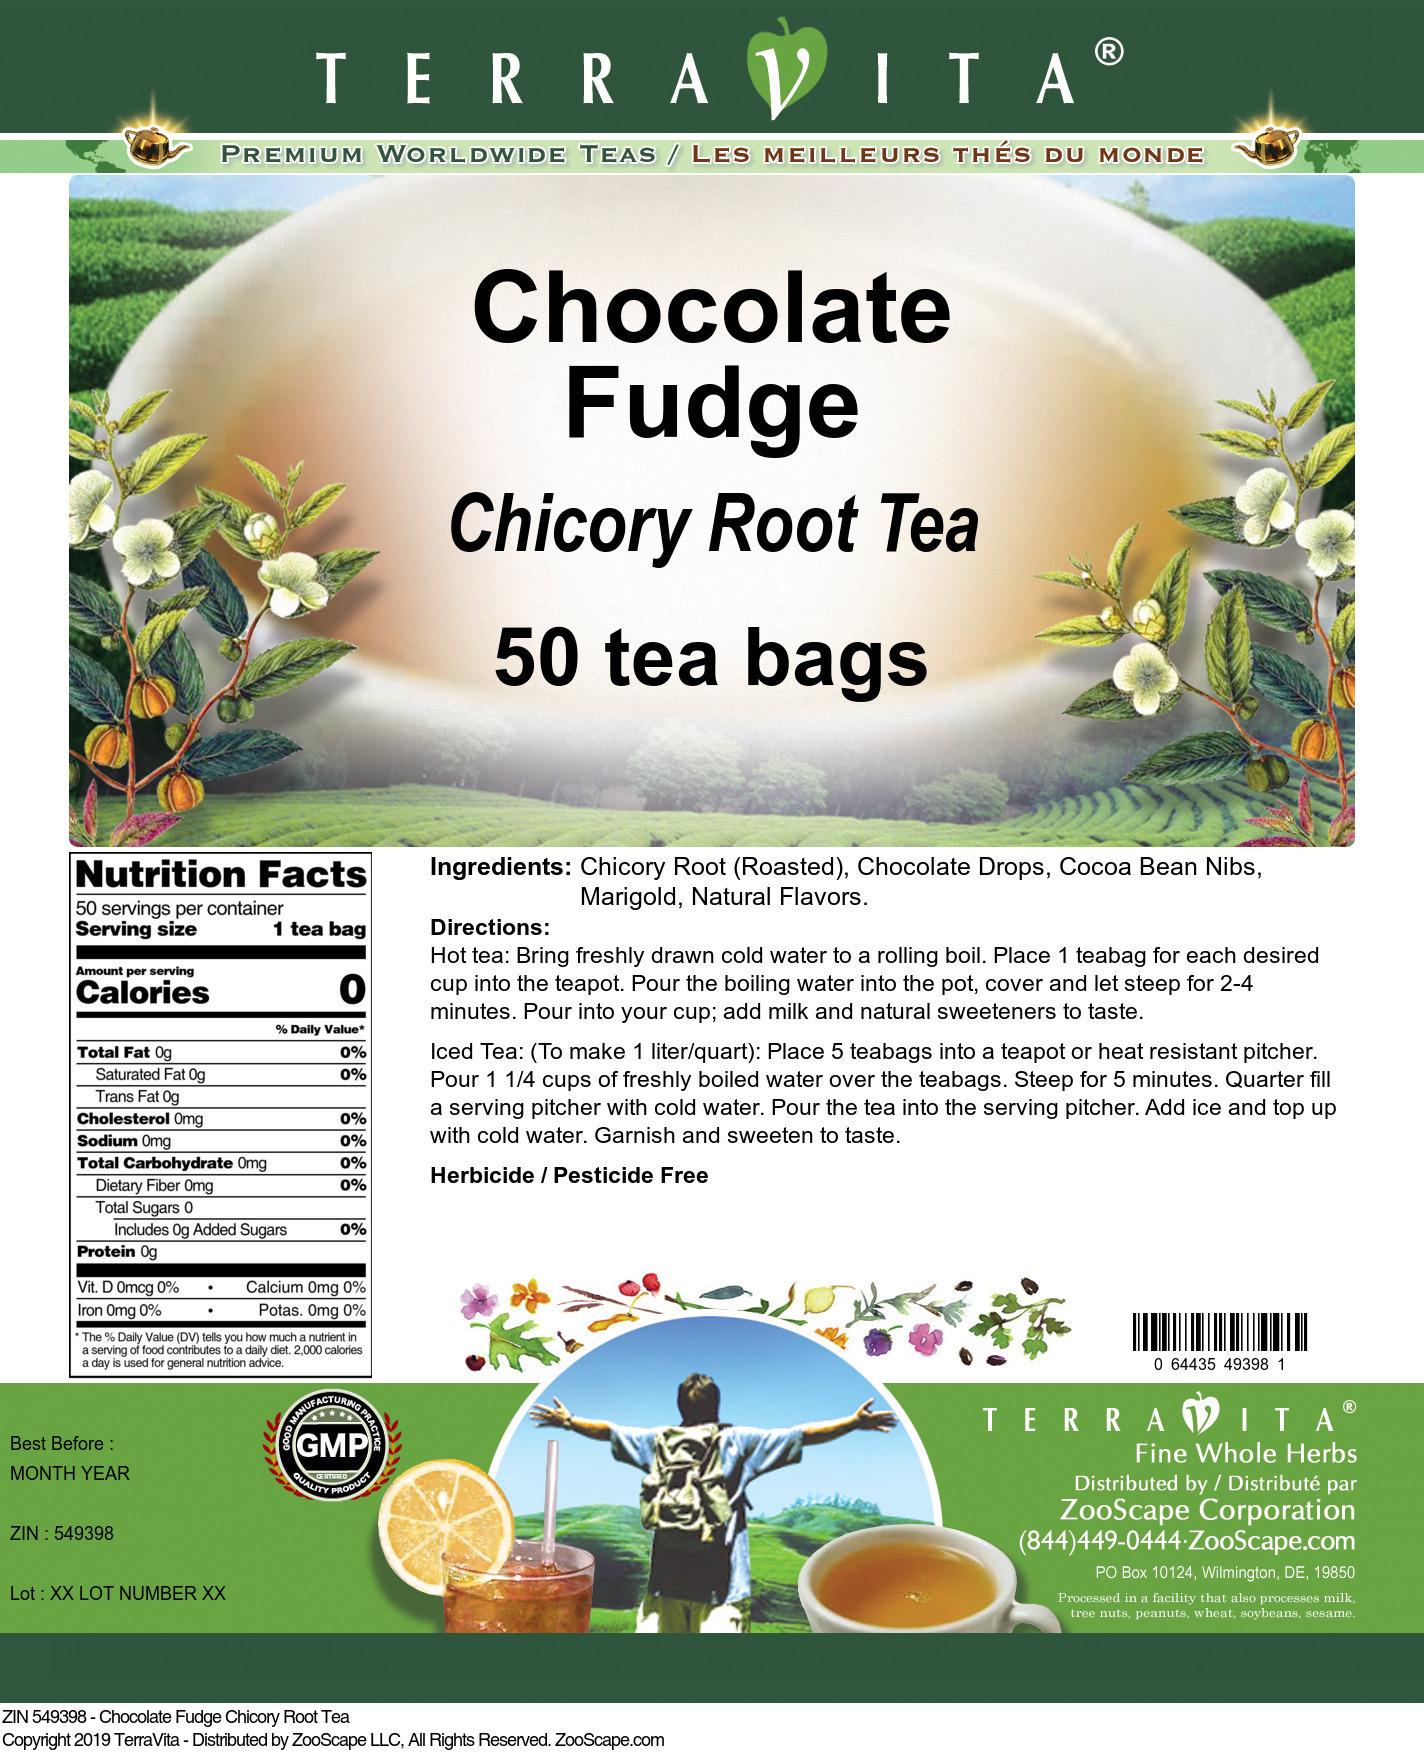 Chocolate Fudge Chicory Root Tea